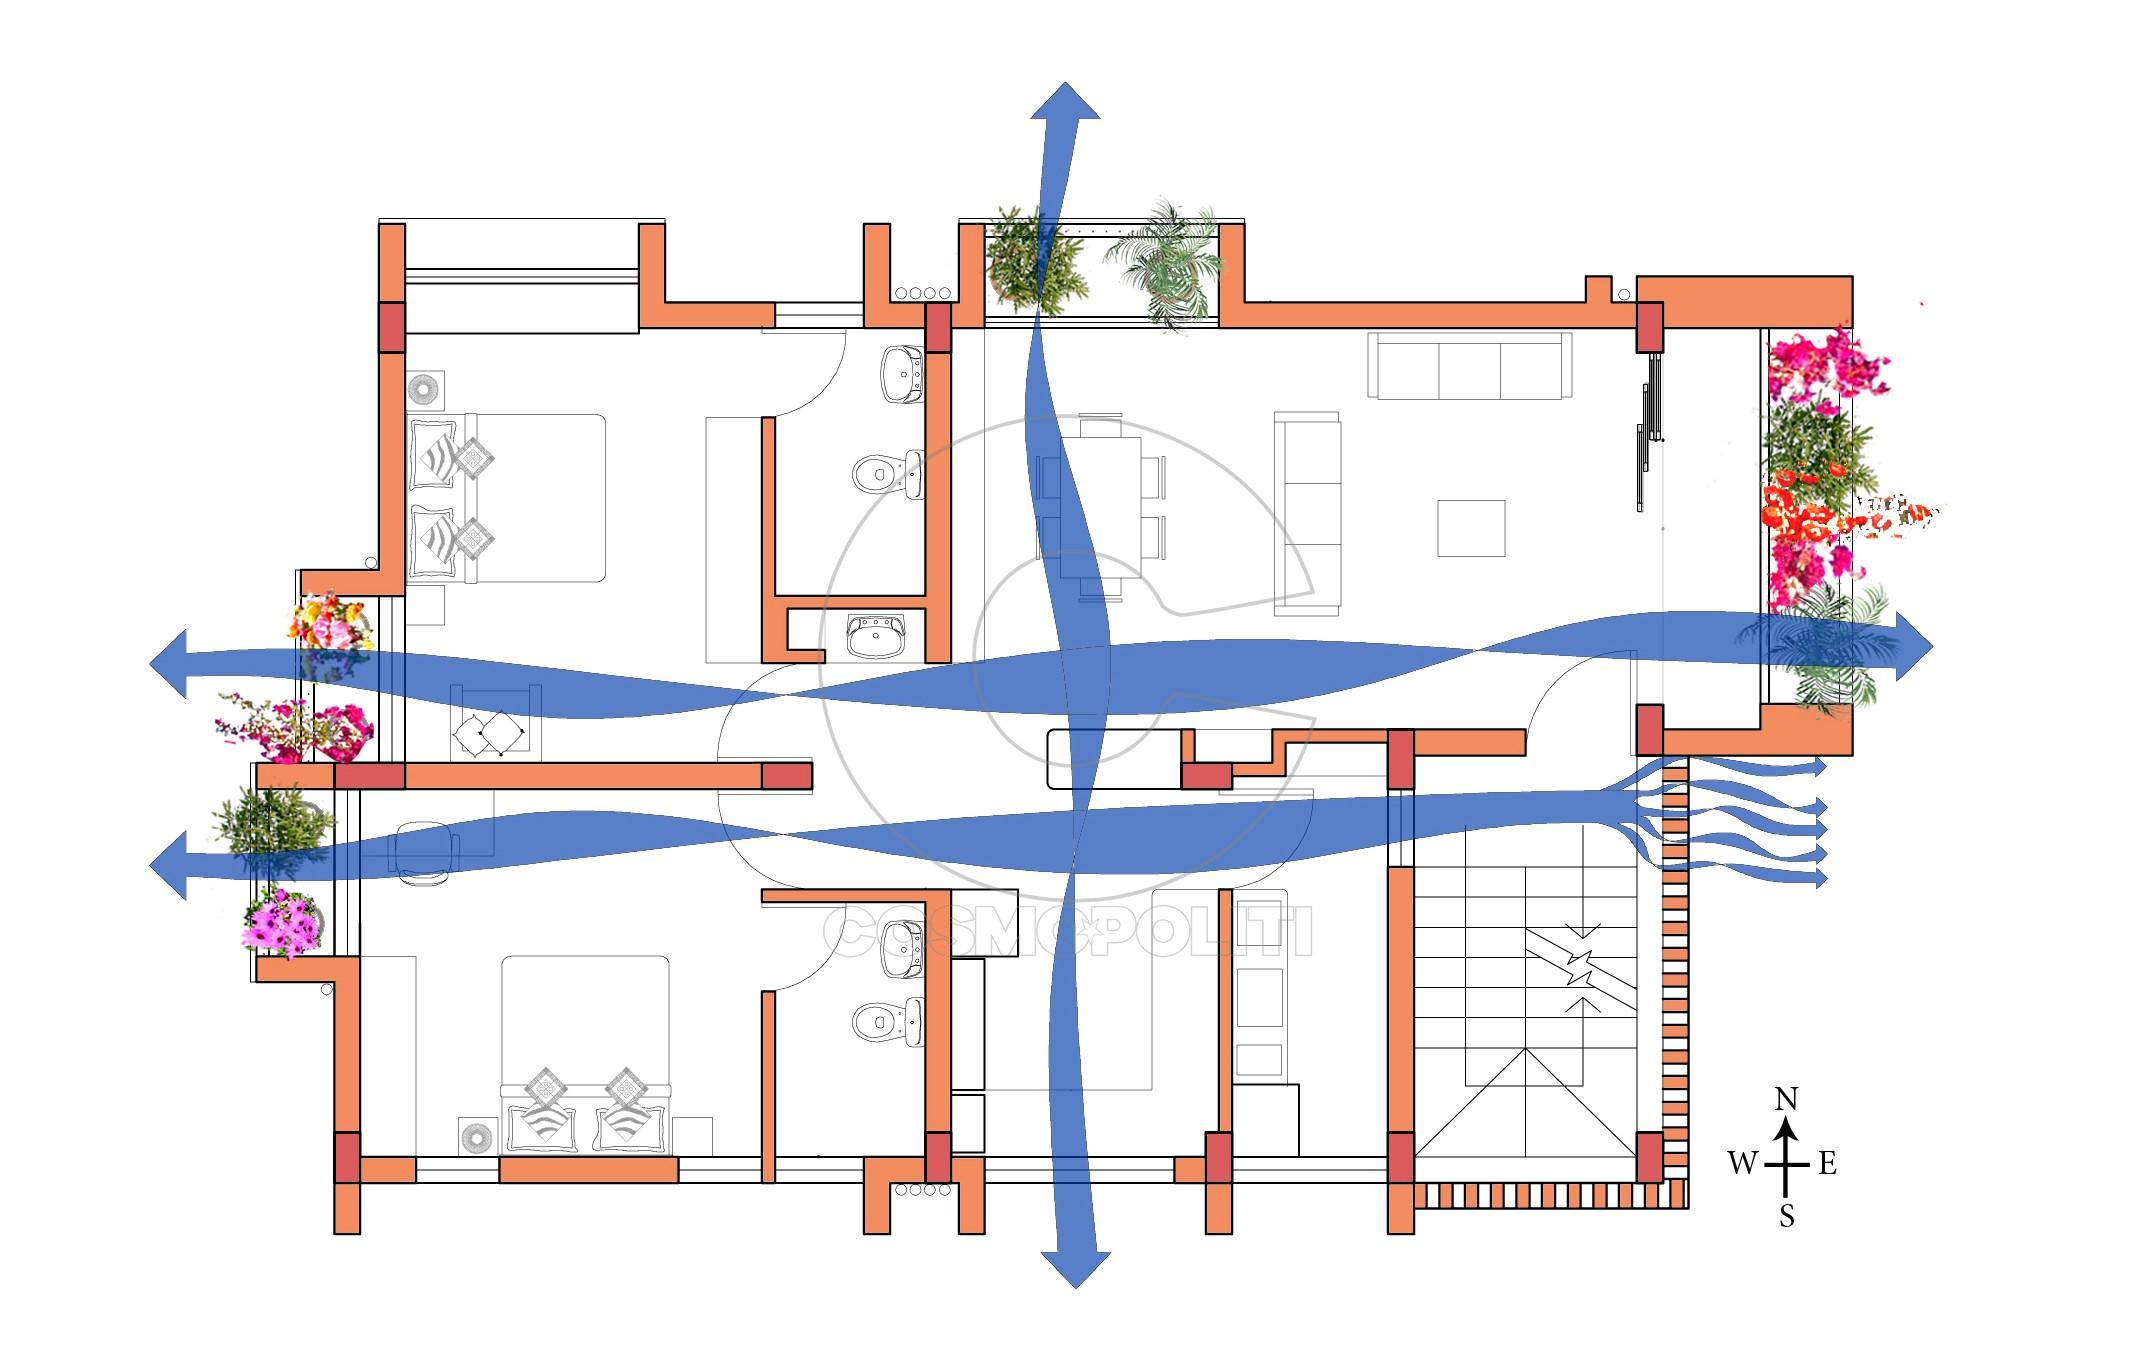 F:HOUSEwebsiteplans.dwg Model (1)